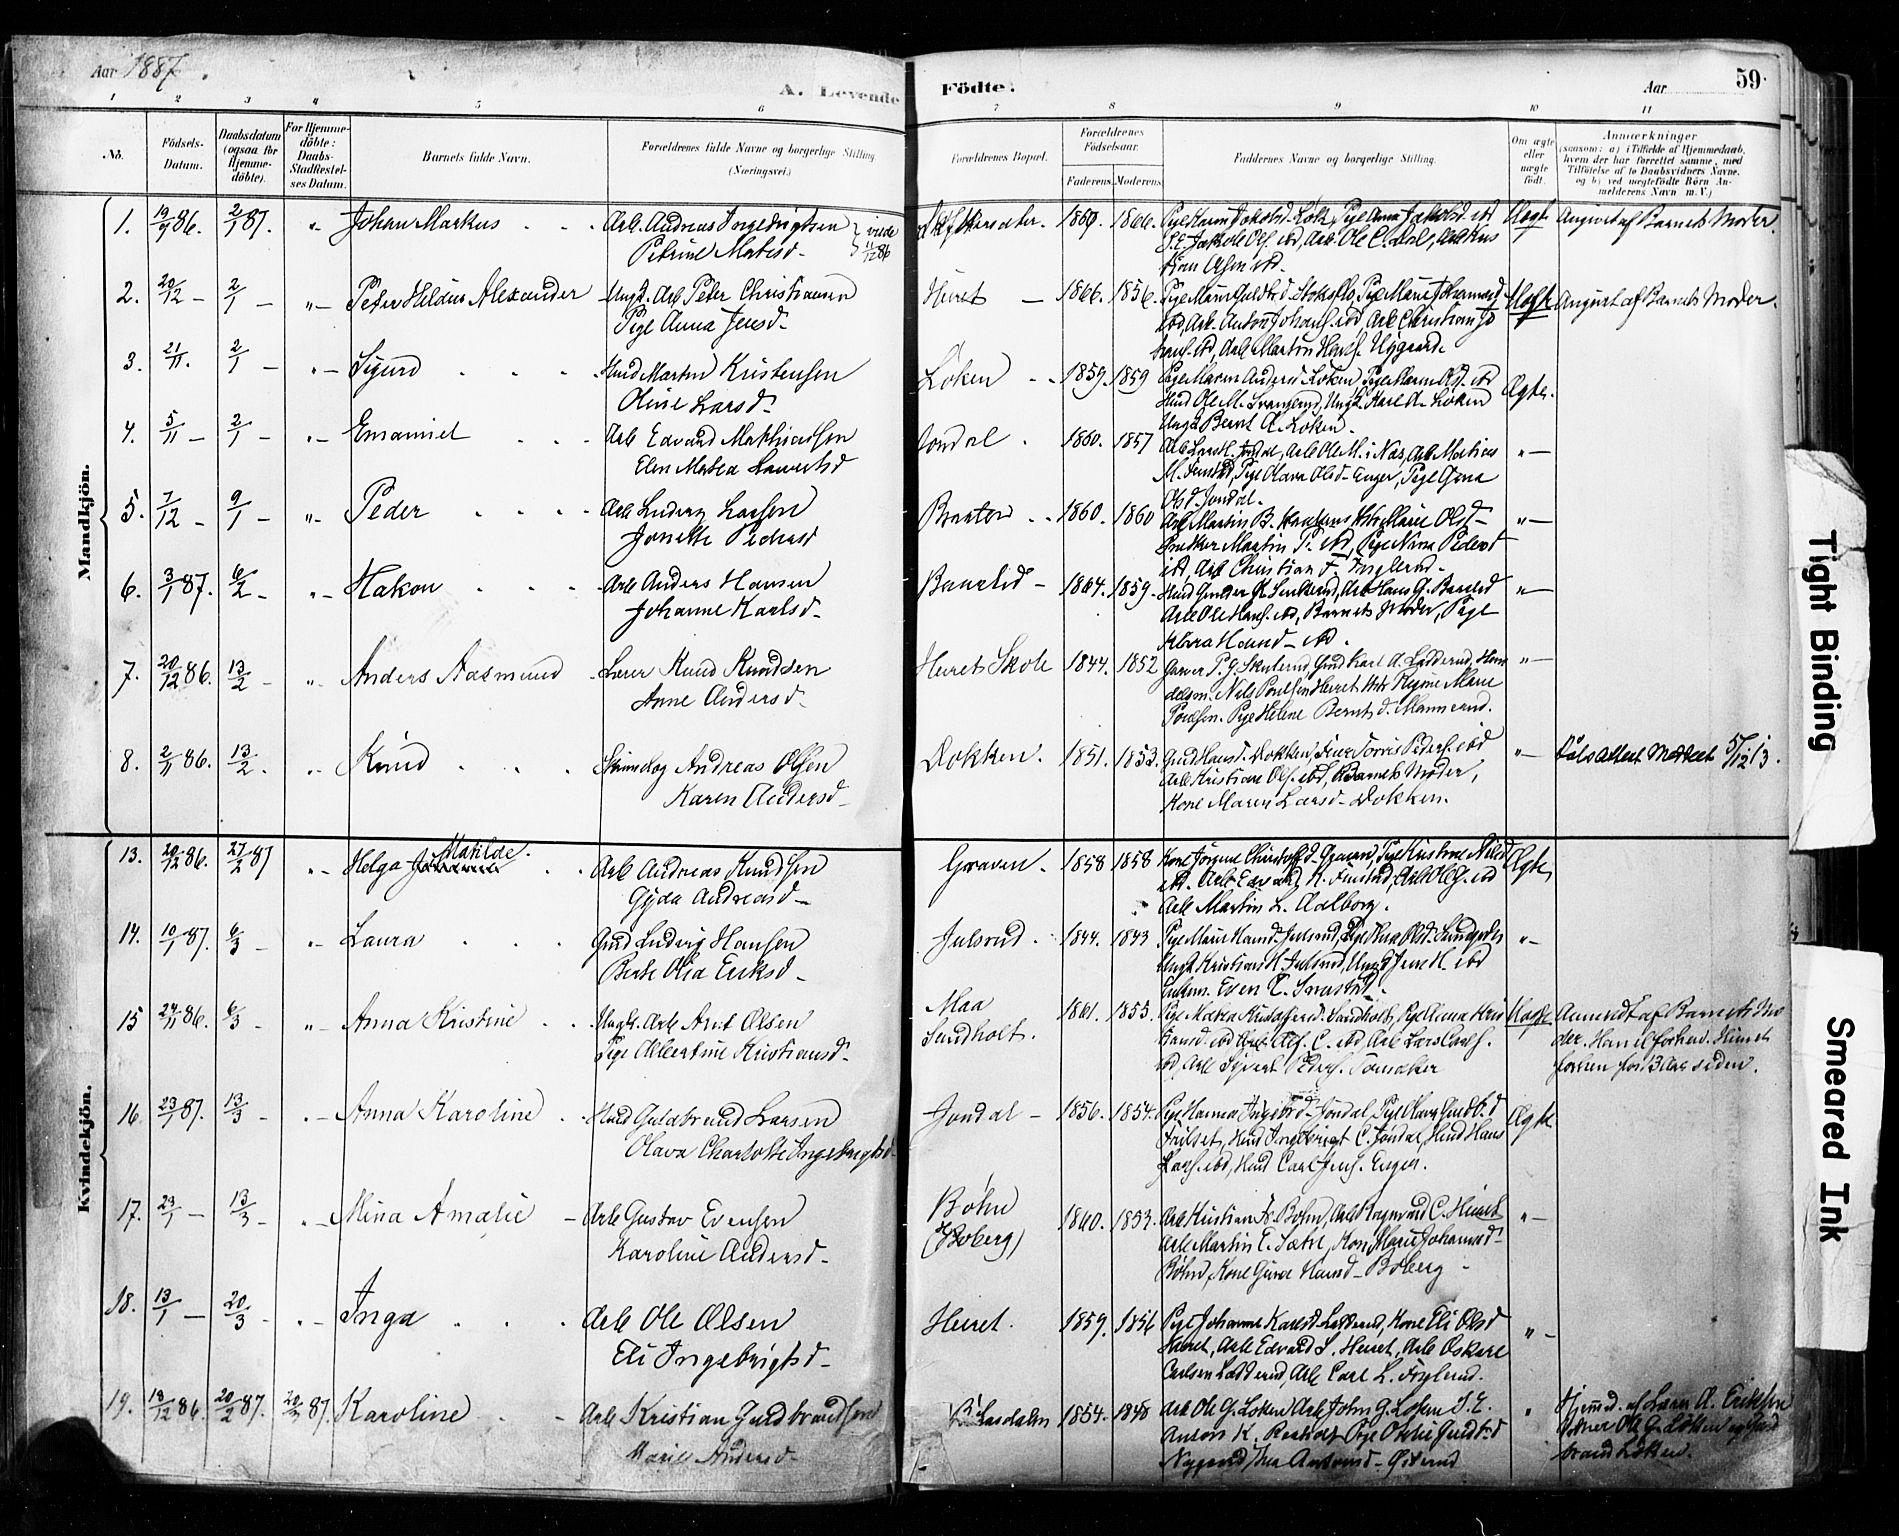 SAO, Eidsvoll prestekontor Kirkebøker, F/Fa/L0002: Parish register (official) no. I 2, 1882-1895, p. 59